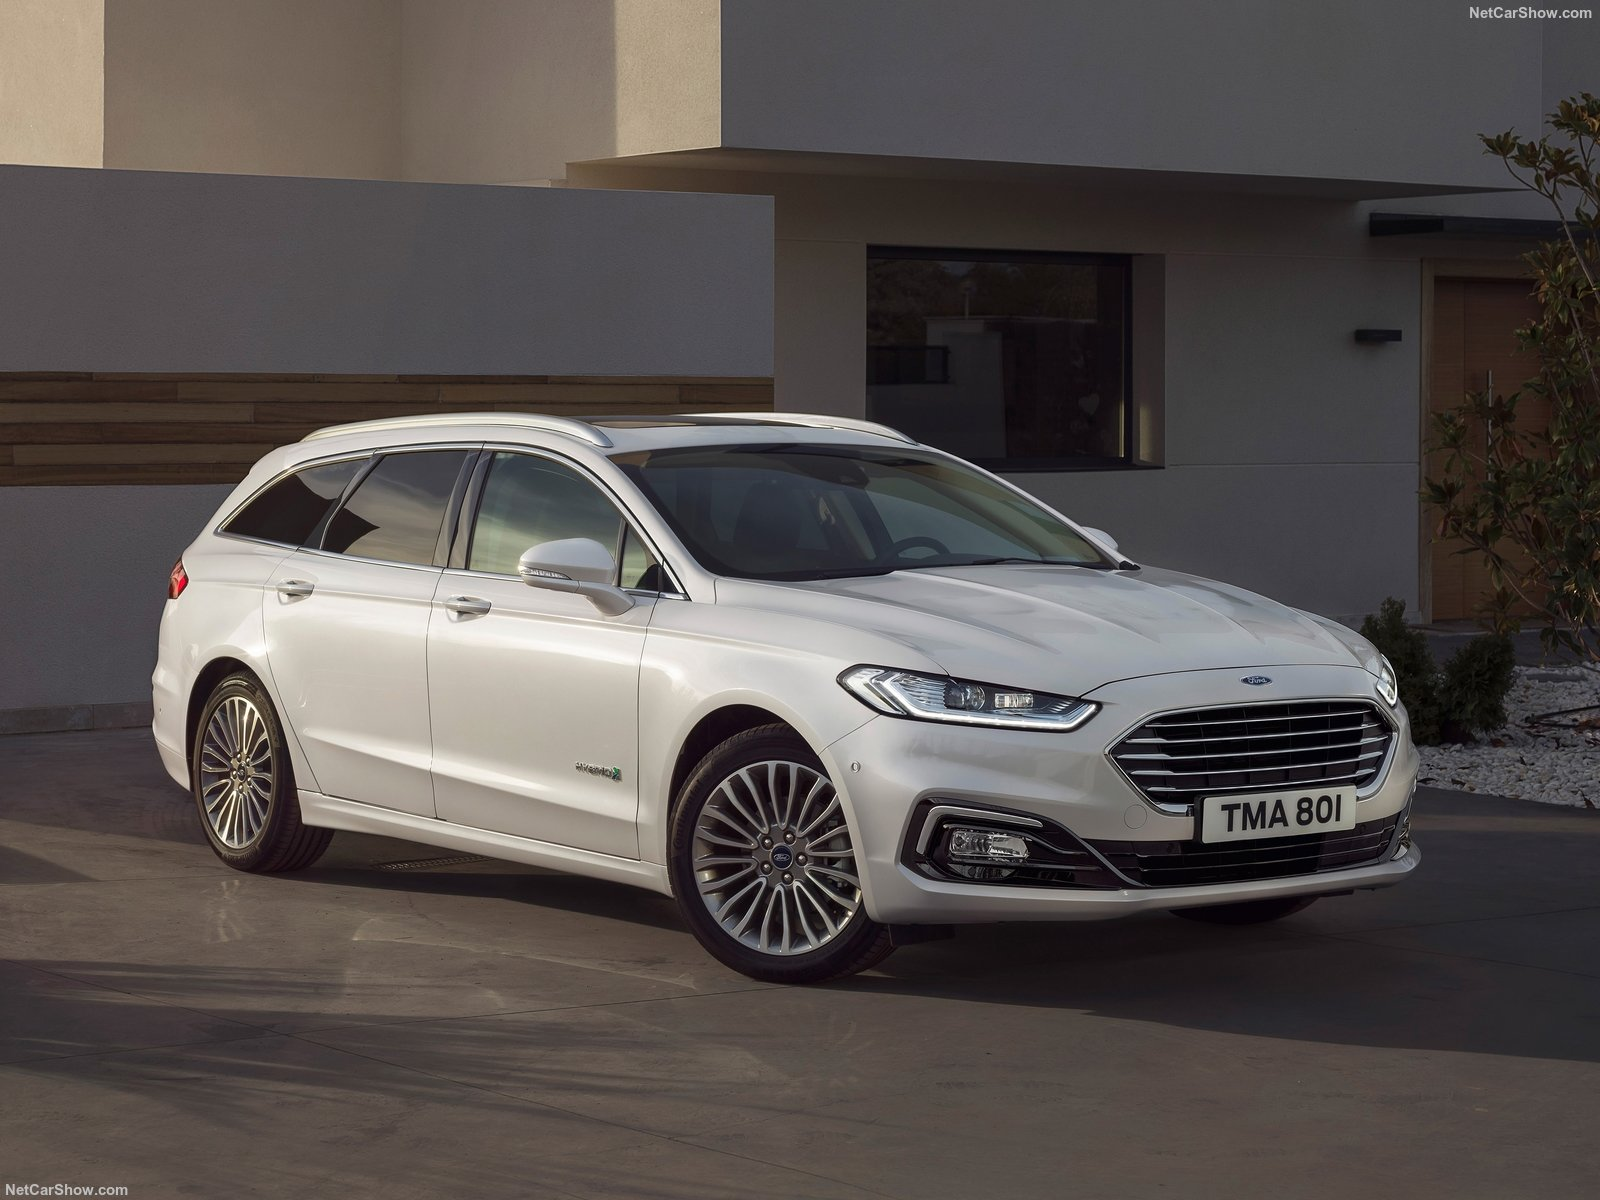 Ford-Mondeo_Wagon_Hybrid-2019-1600-01 (1)